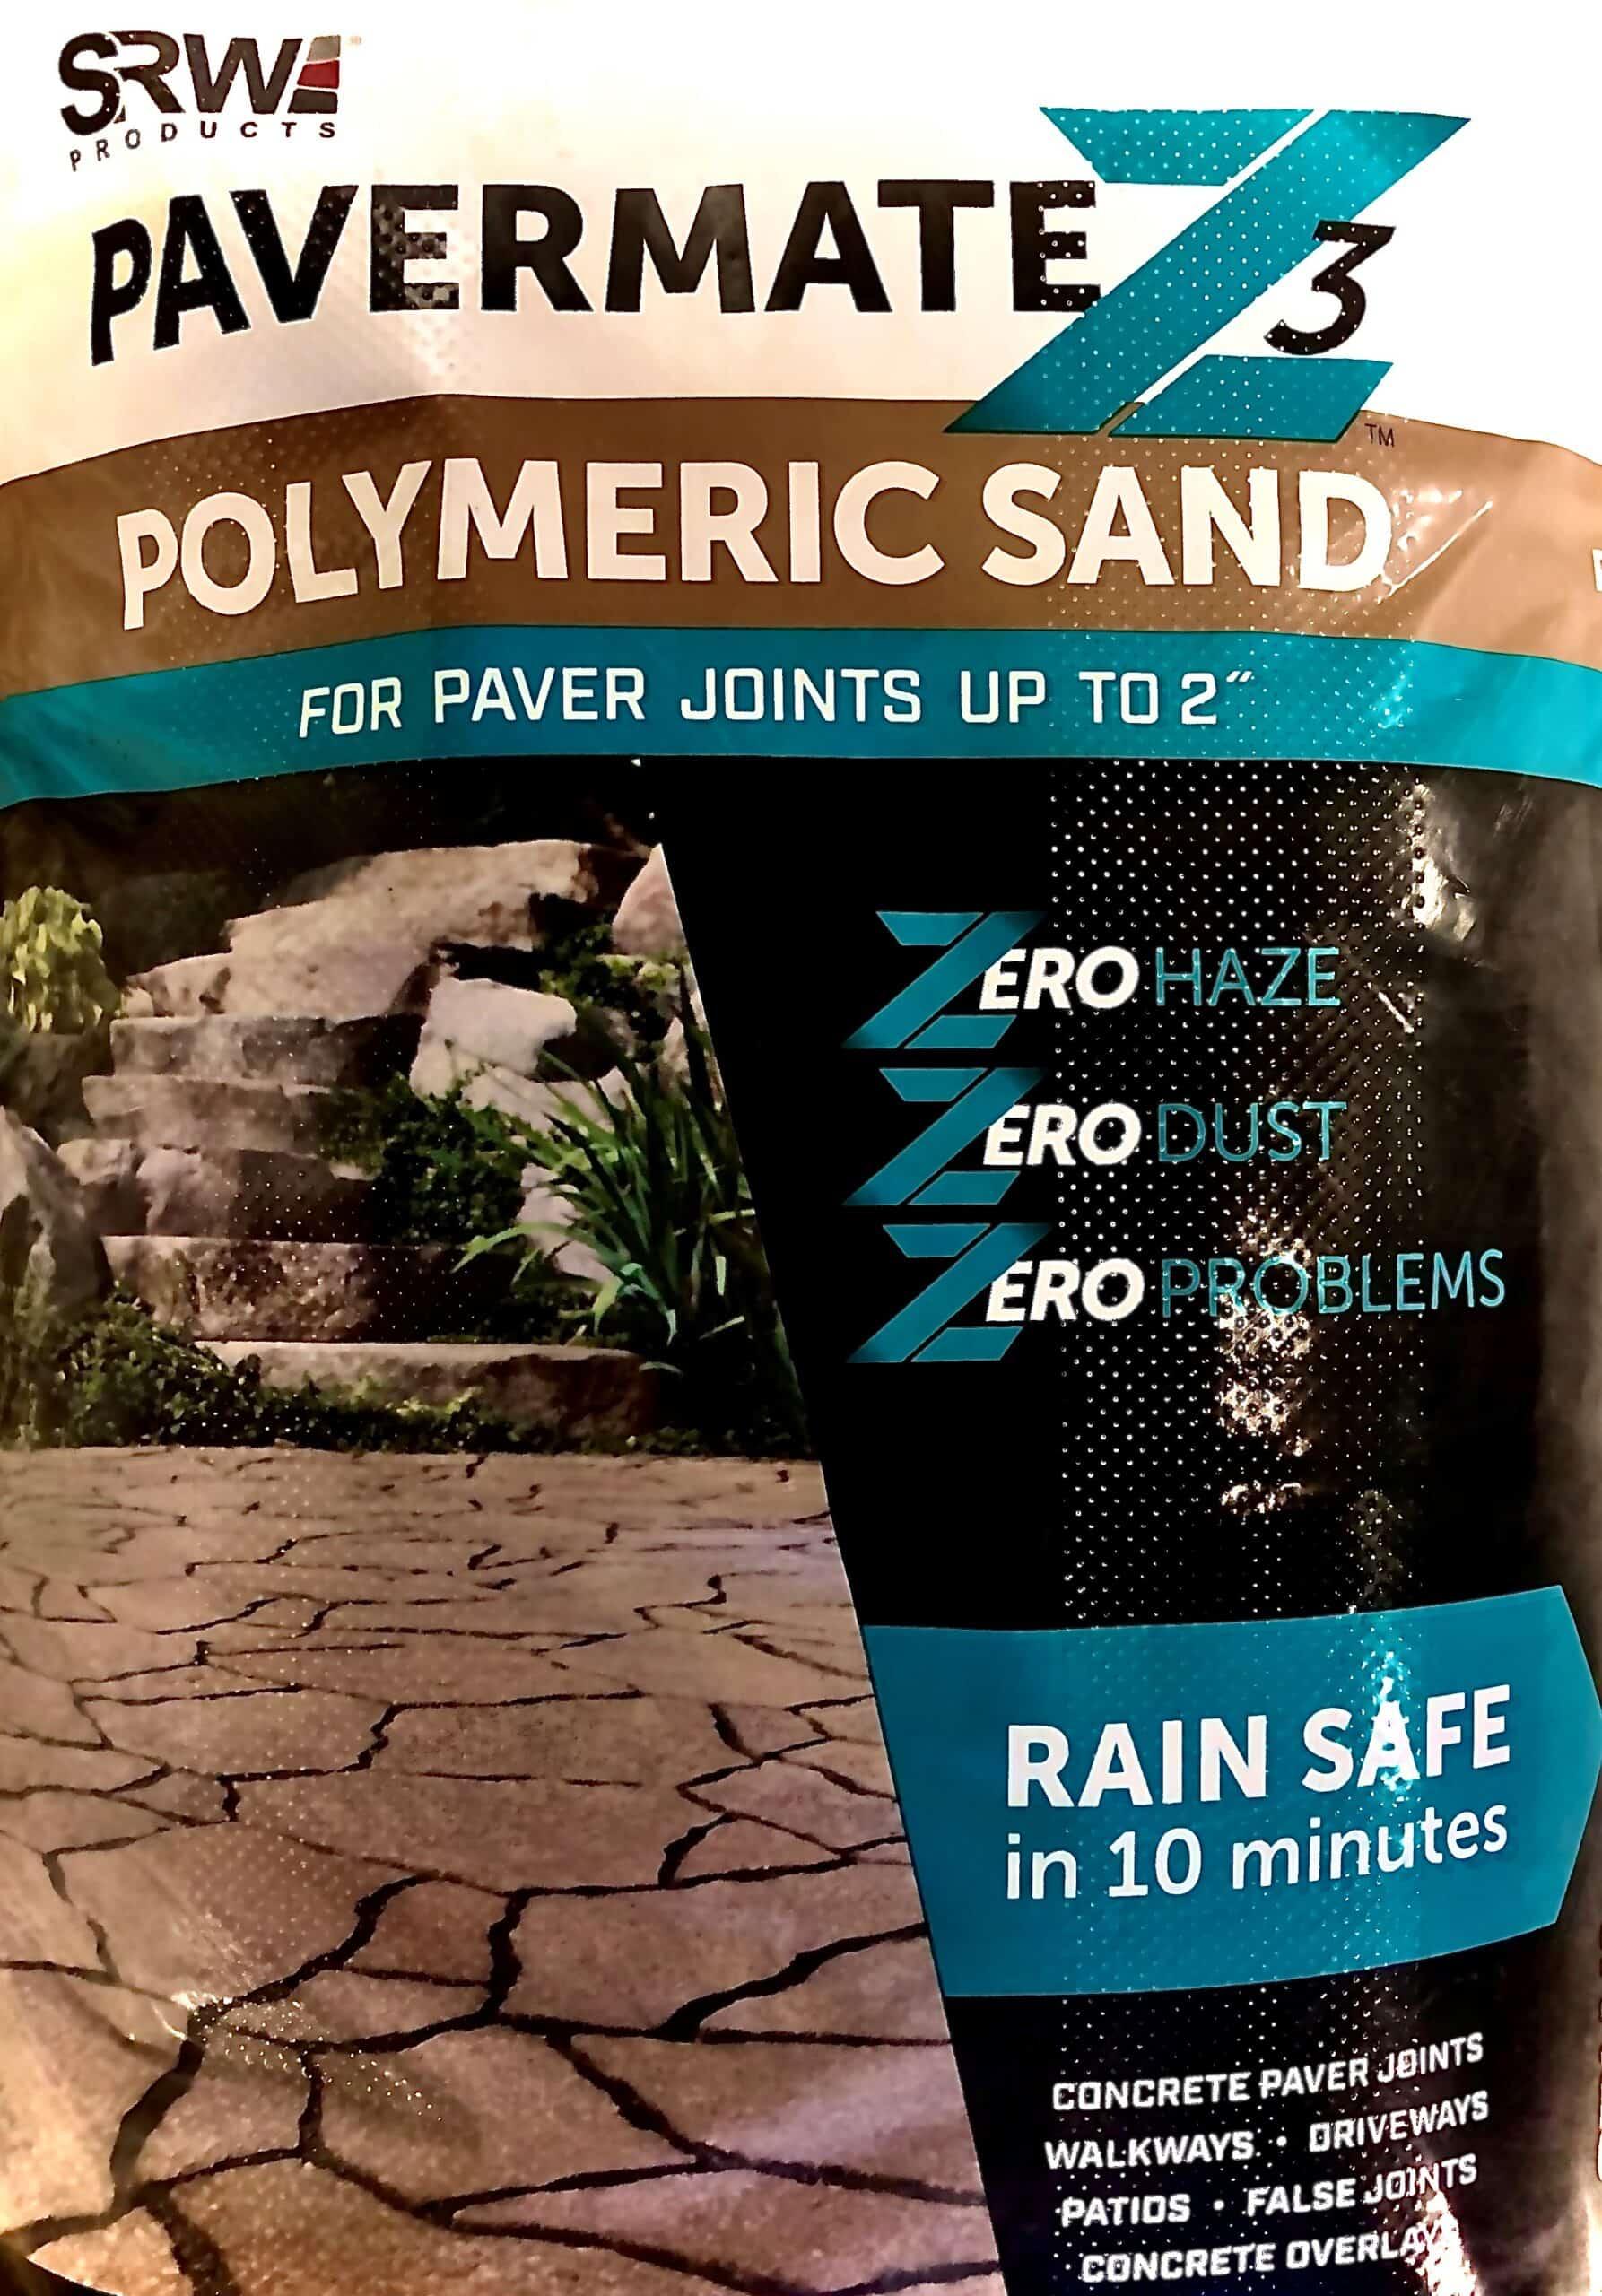 SRW Polymeric Sand - Pavermate